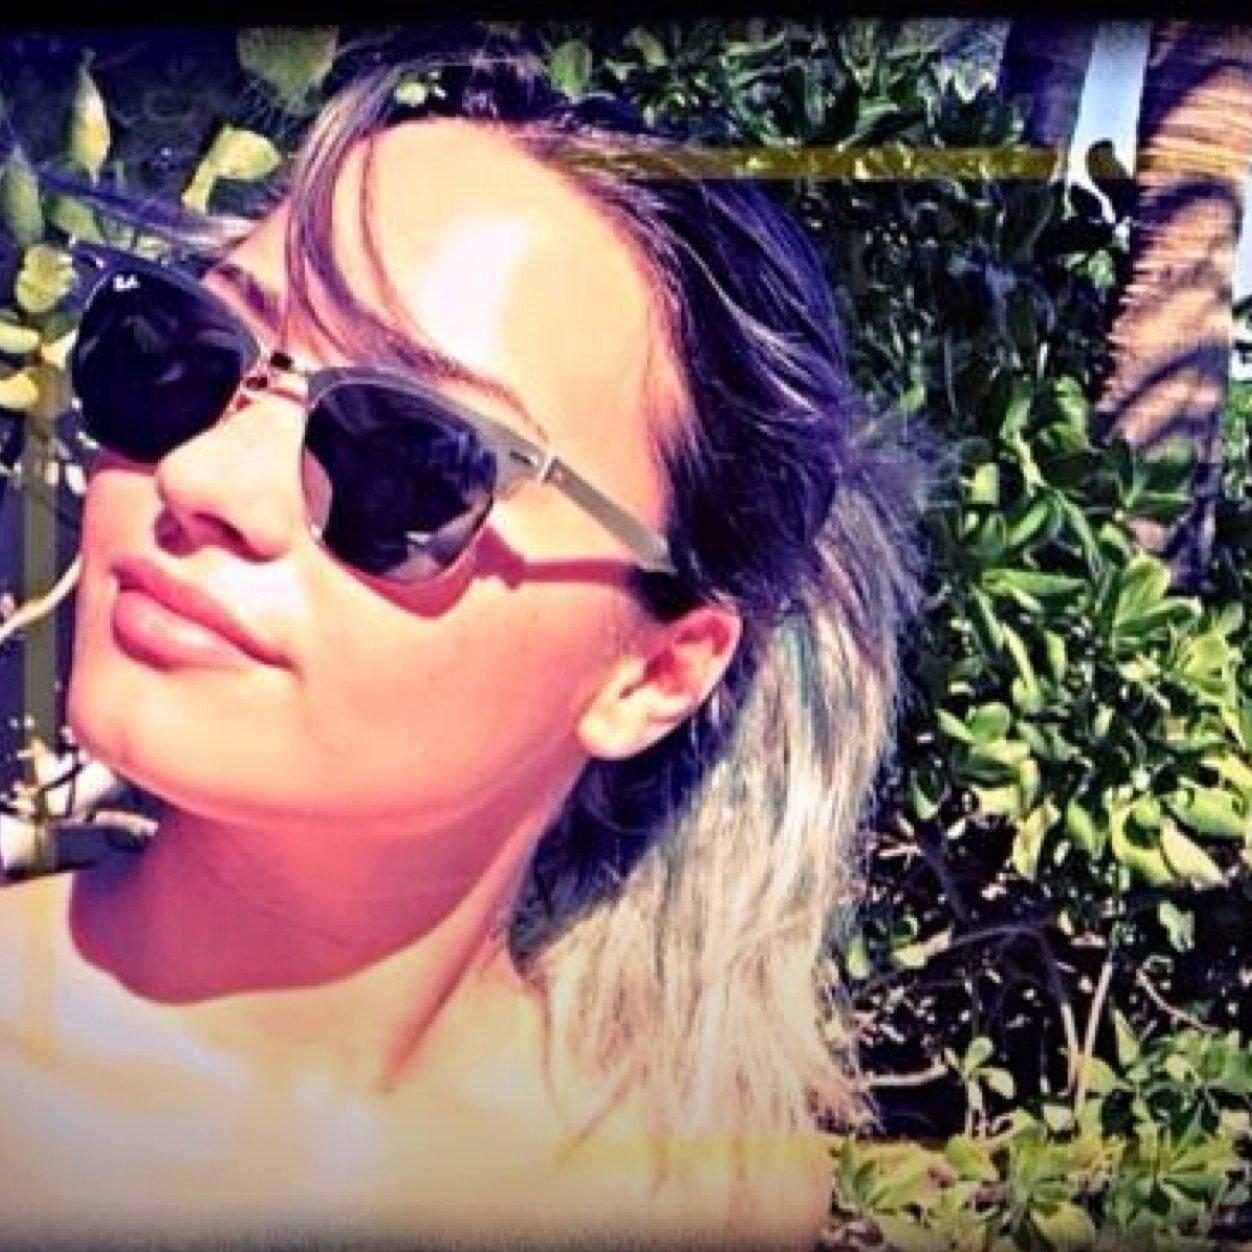 Twitter Demetria Lovato nudes (81 foto and video), Topless, Is a cute, Feet, in bikini 2006